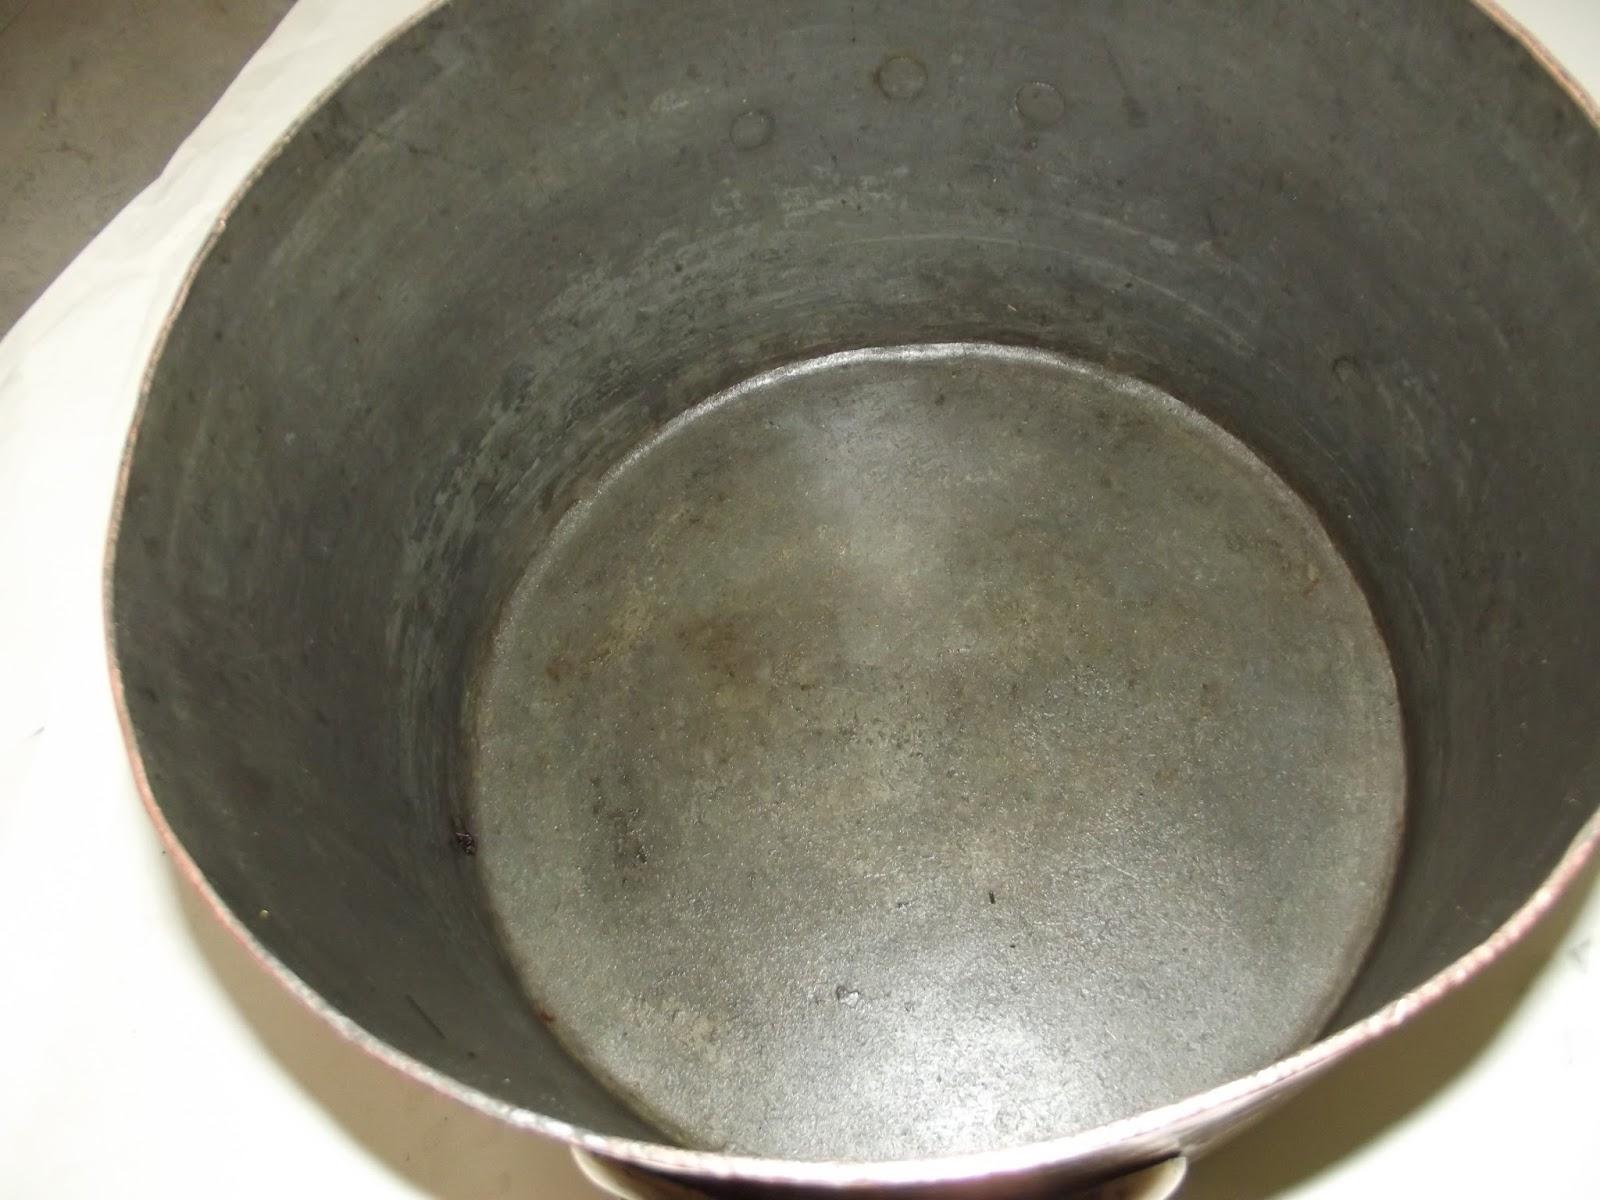 marmite casserole cuivre tam martel queue d 39 aronde poign es bronze ancien xix. Black Bedroom Furniture Sets. Home Design Ideas